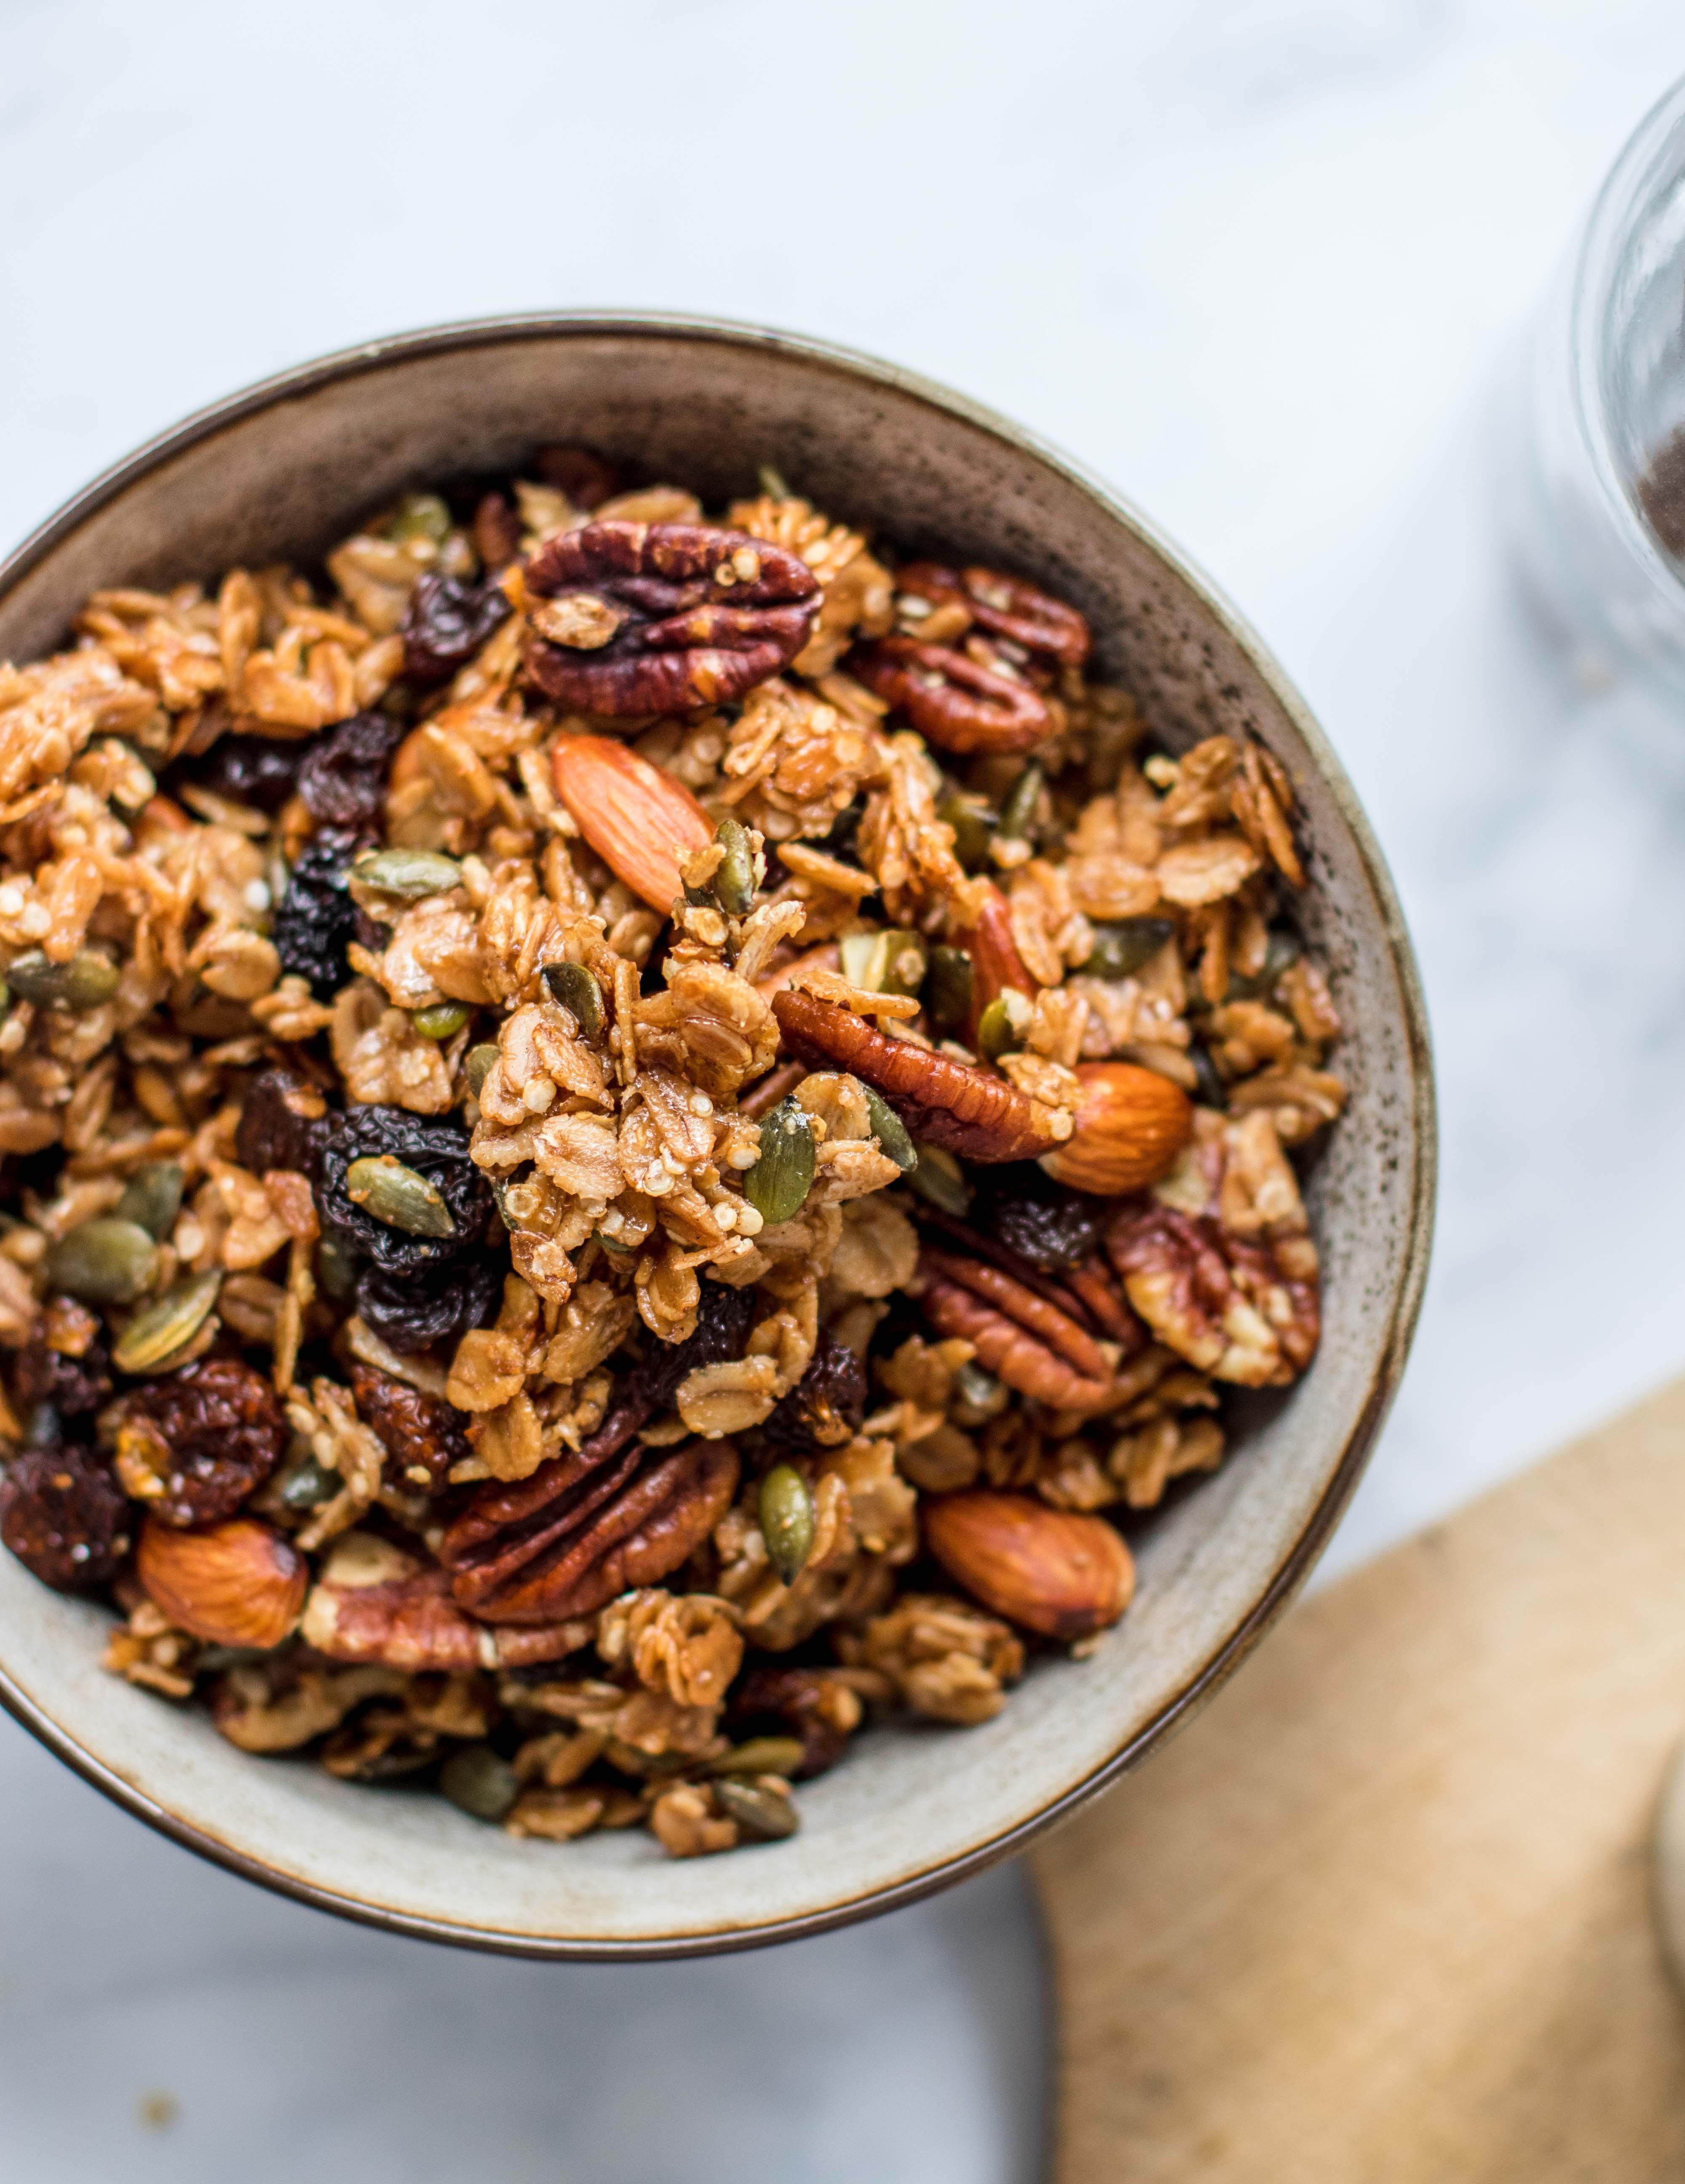 Homemade Nut Granola With Pecans And Quinoa Flakes Klara S Life